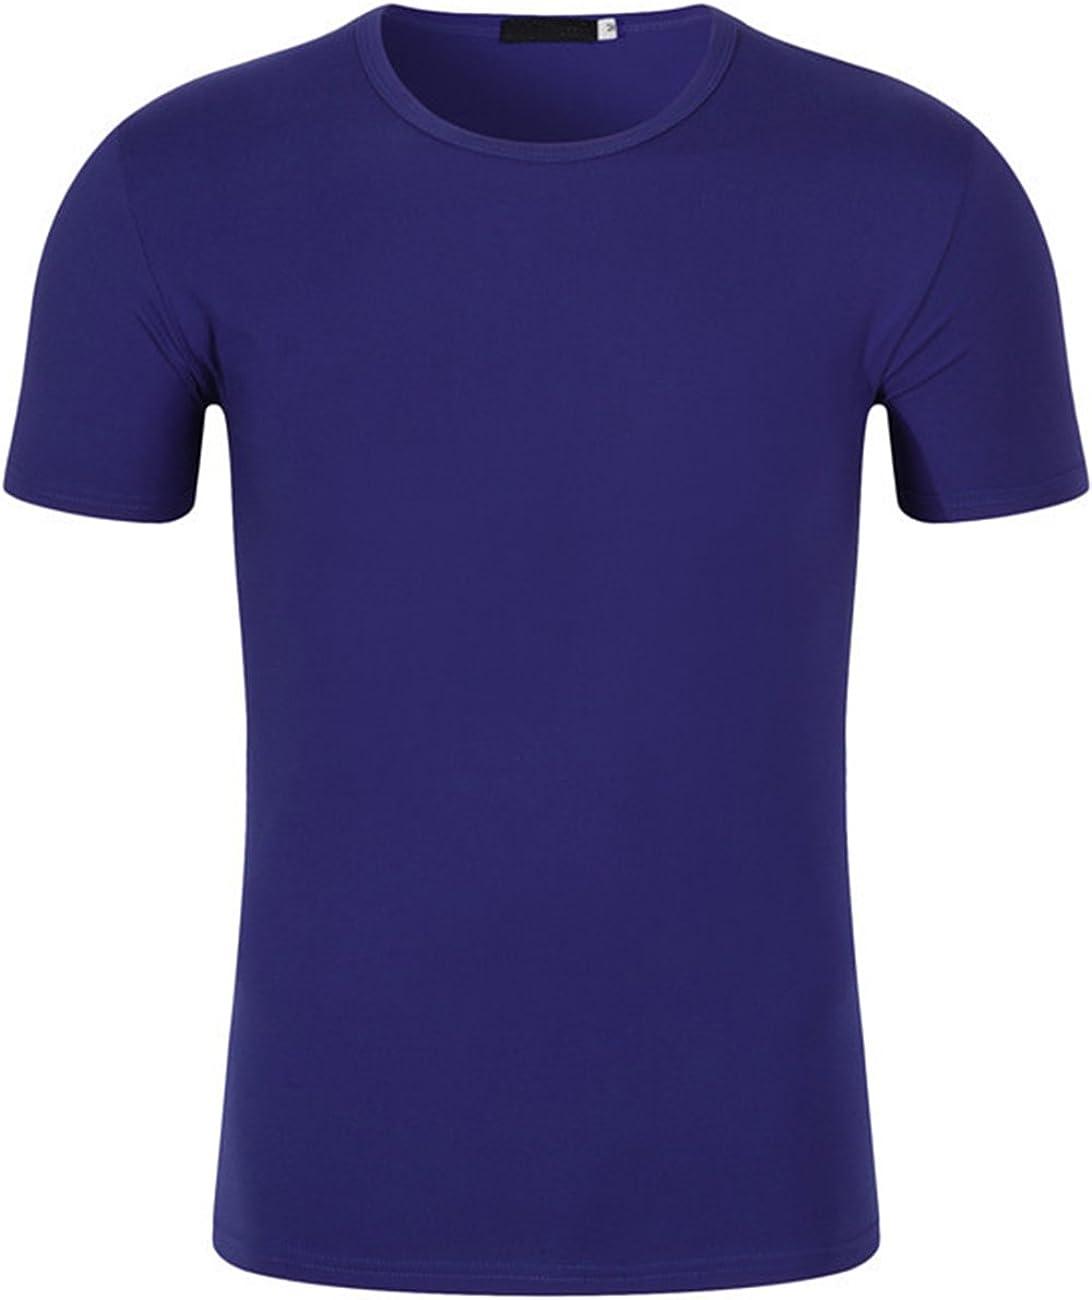 DOKKIA Men's Casual Tops Cotton Crew Neck Plain Short Sleeve Tees T-Shirt